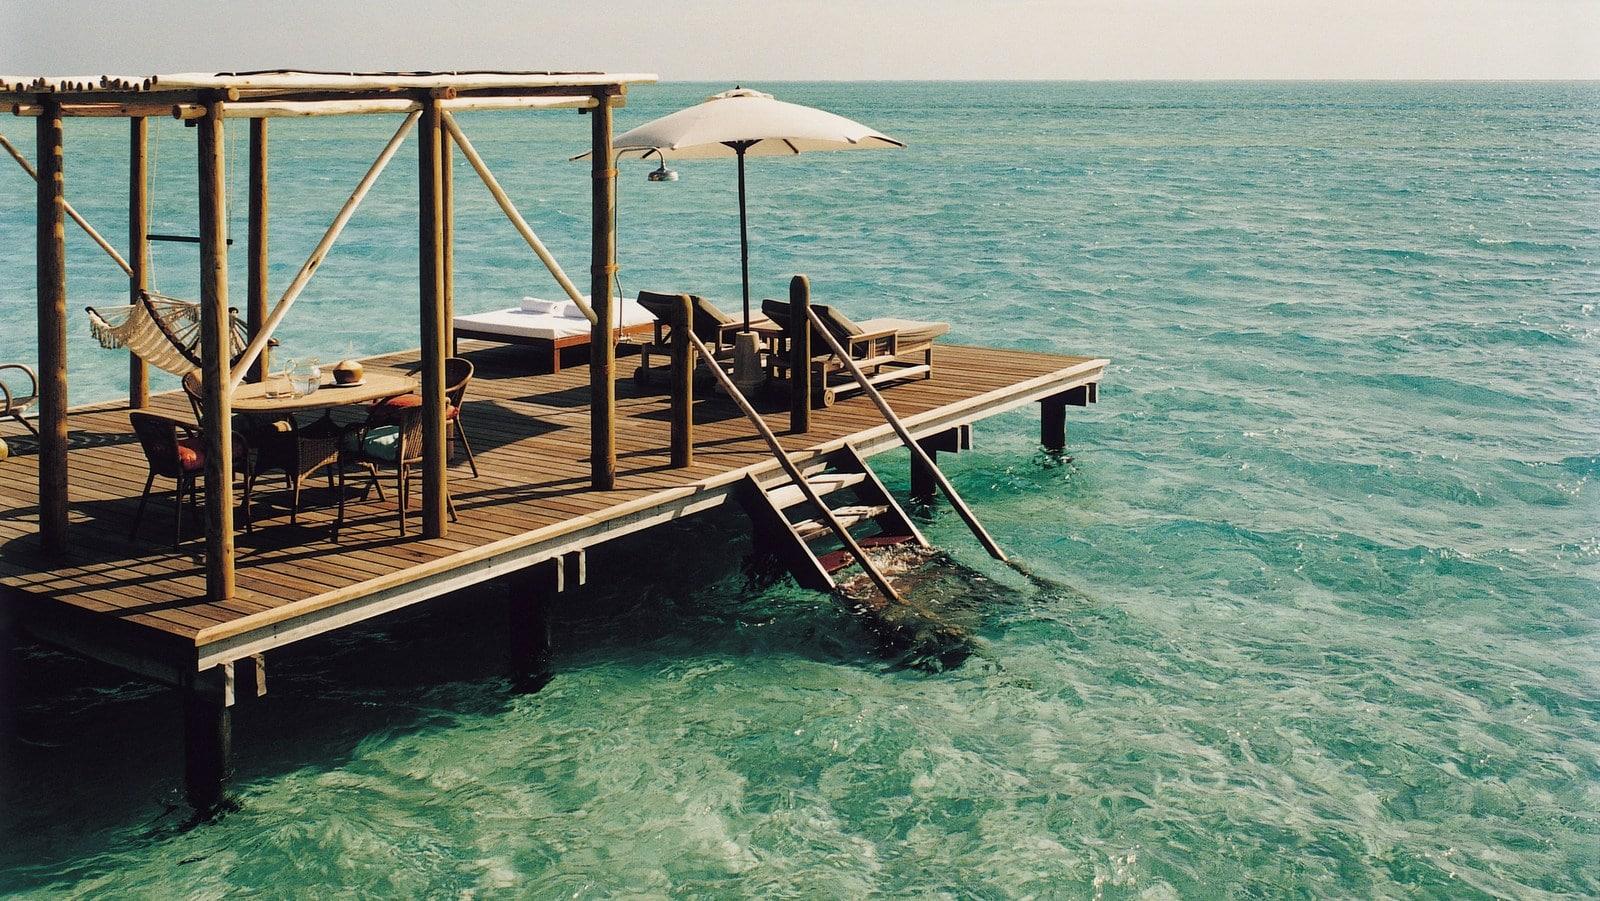 Мальдивы, Отель COMO Cocoa Island, номер COMO Water Villa